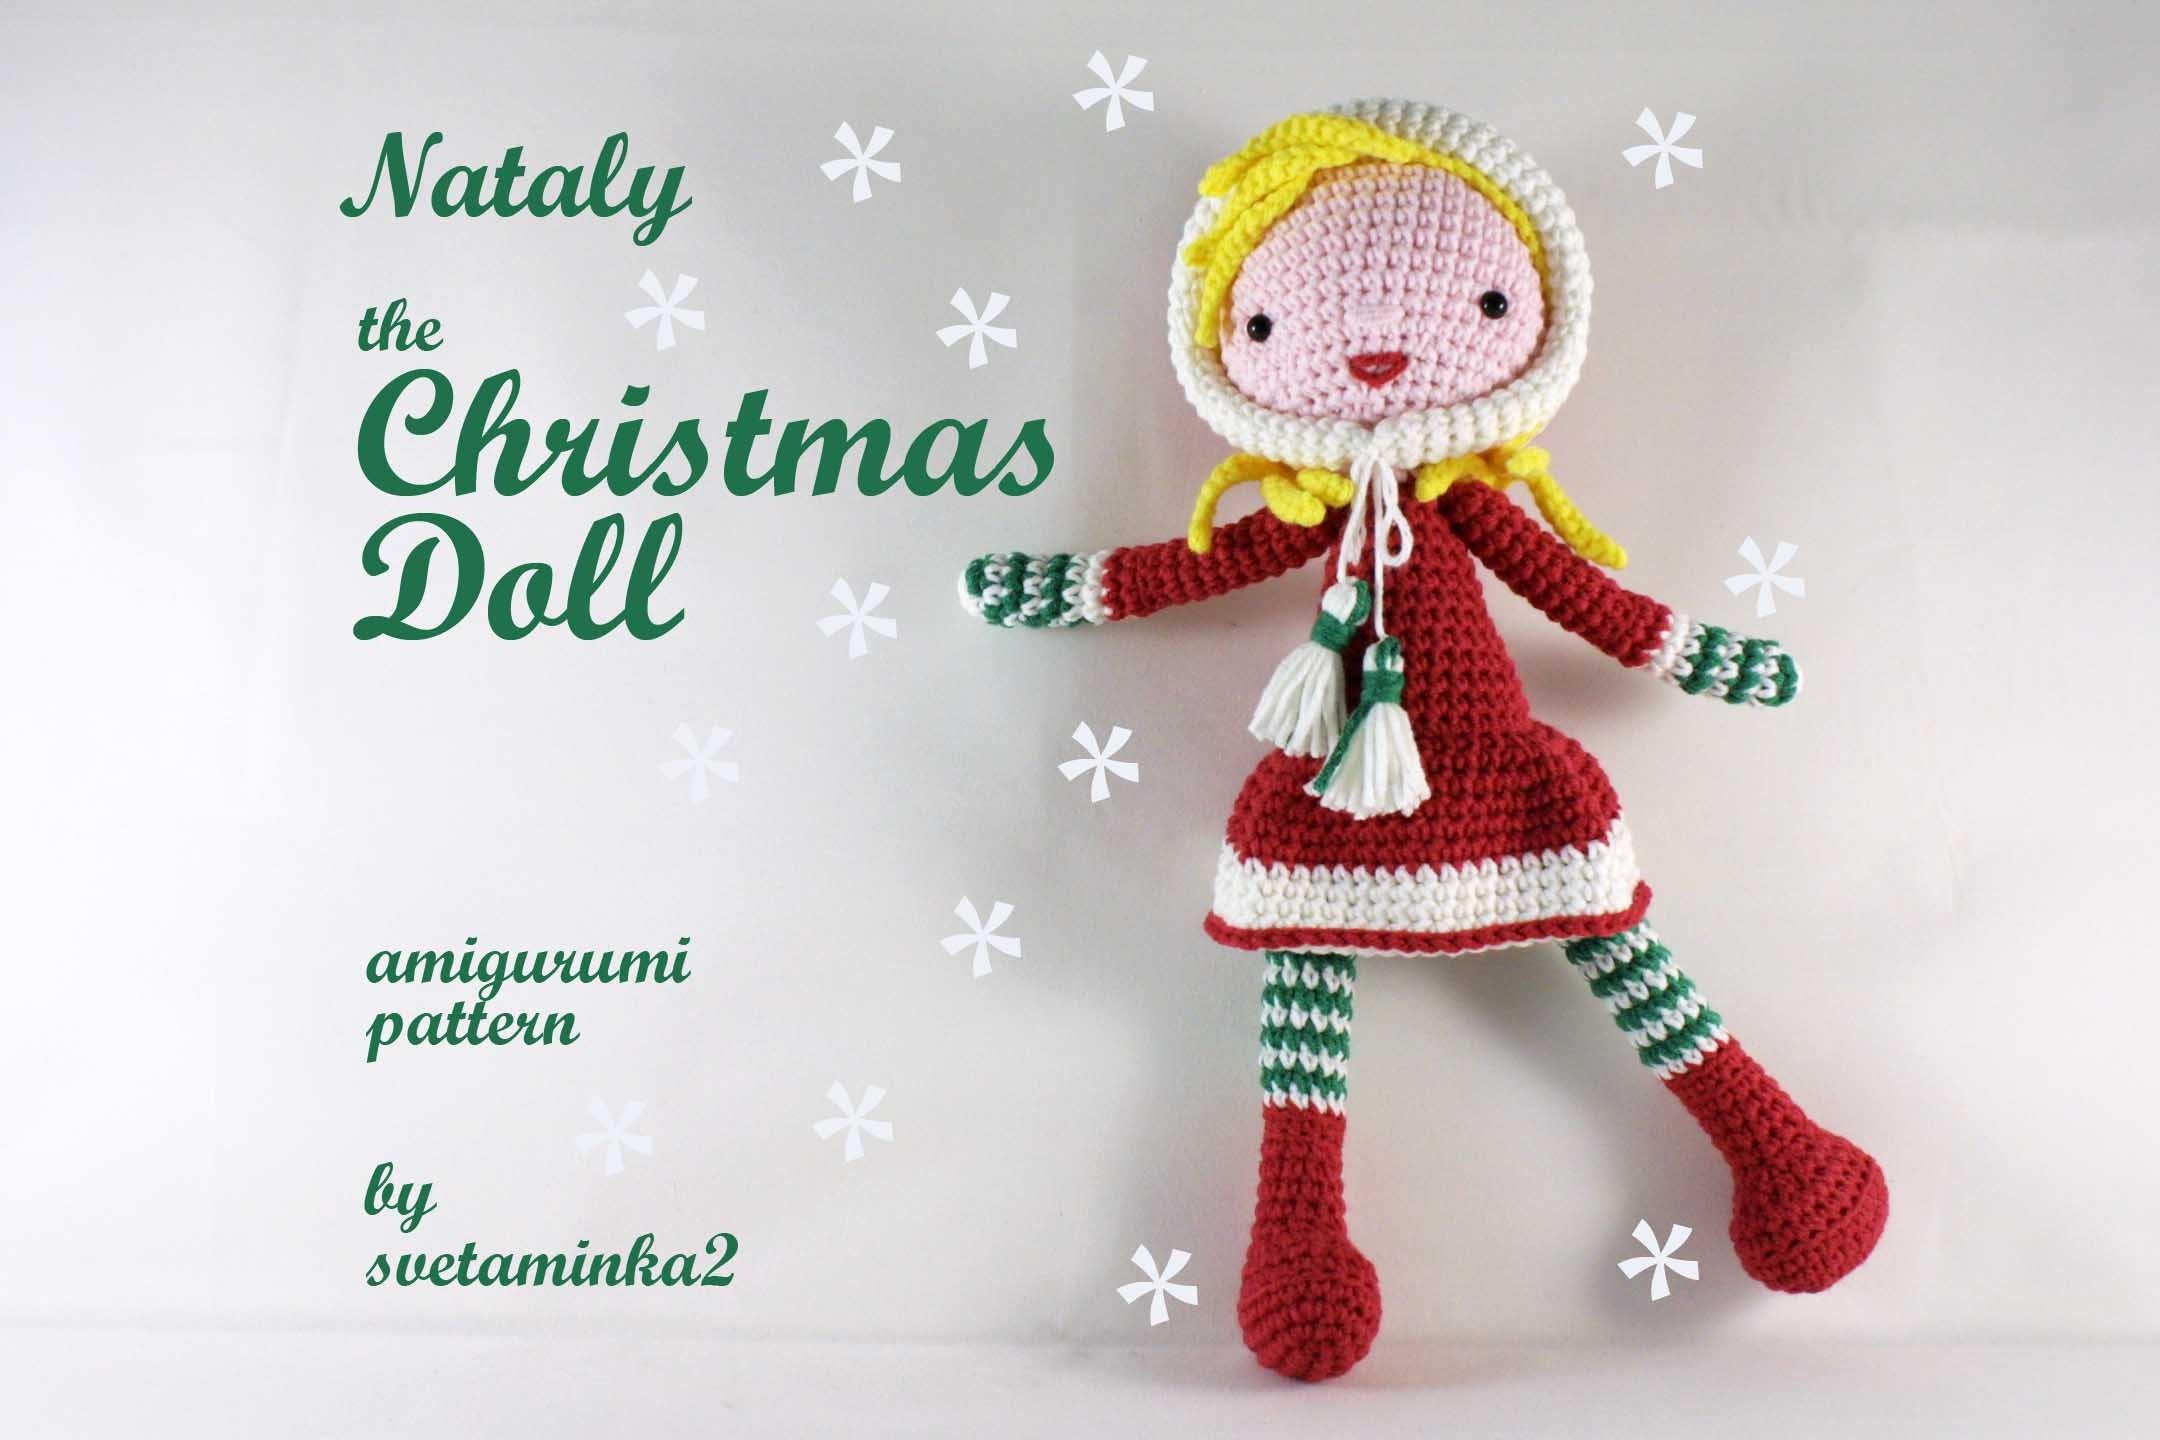 Best Amigurumi Tips and Tricks for Doll Faces - thefriendlyredfox.com | 1440x2160